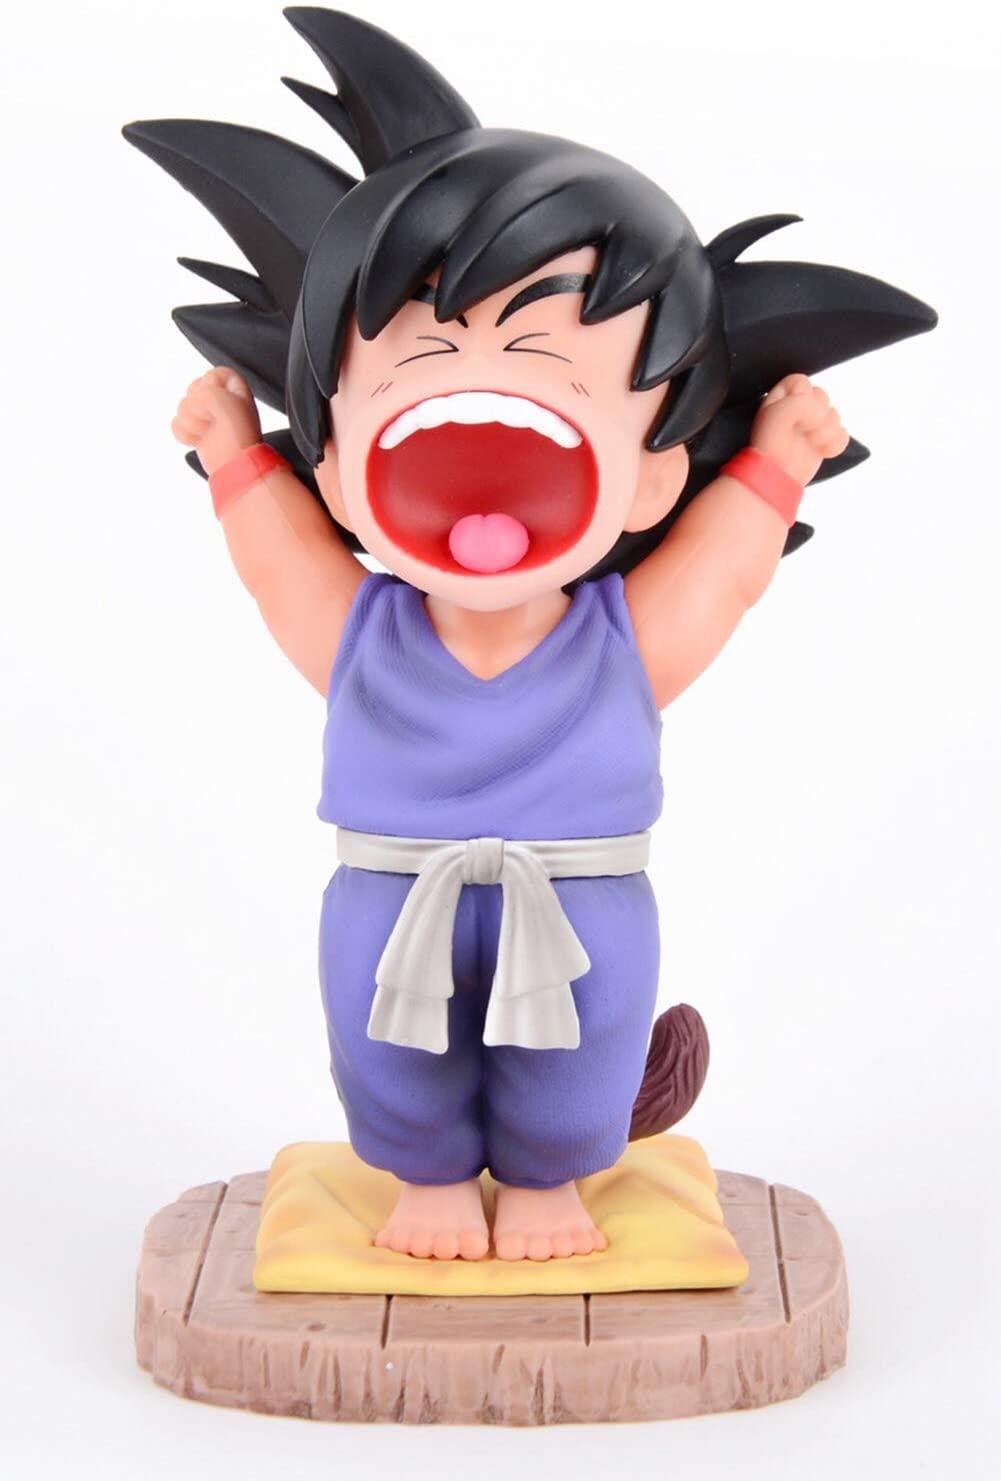 SURUIMA Dragon Ball Z Actions Figures GK Good Morning Goku Figure Statues Figurine Collection Birthday Gifts PVC 5 Inch DBZ (Good Morning Goku B)